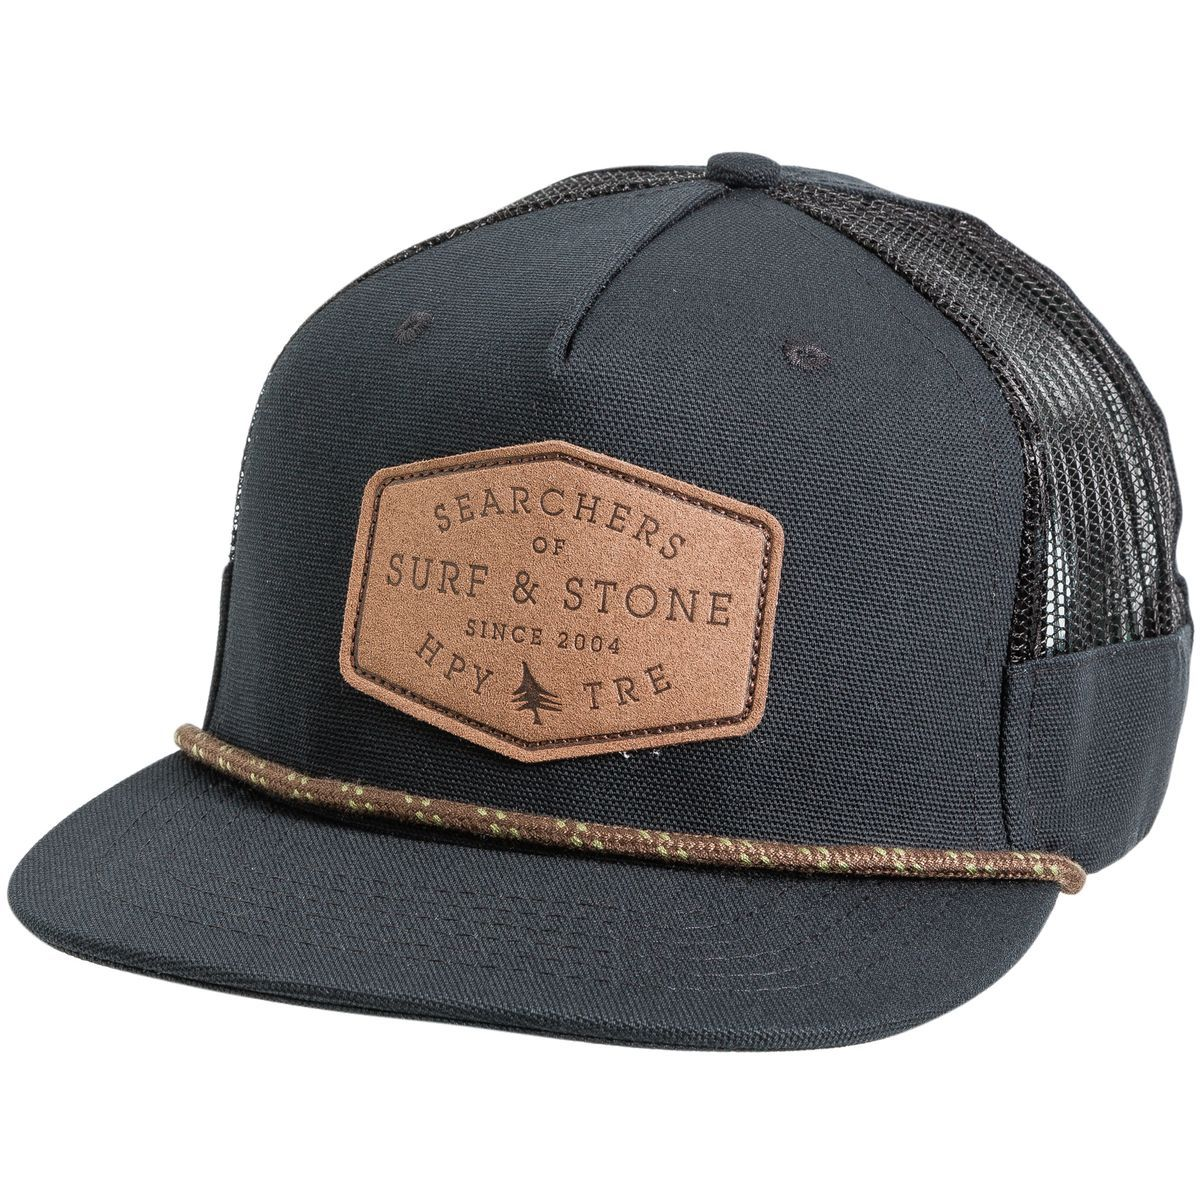 7236e2faf8c HippyTree Compound Hat. Men s flat brim hat. Five panel mid-profile design.  Adjustable snap back. Organic cotton canvas exterior. Mesh side vents.